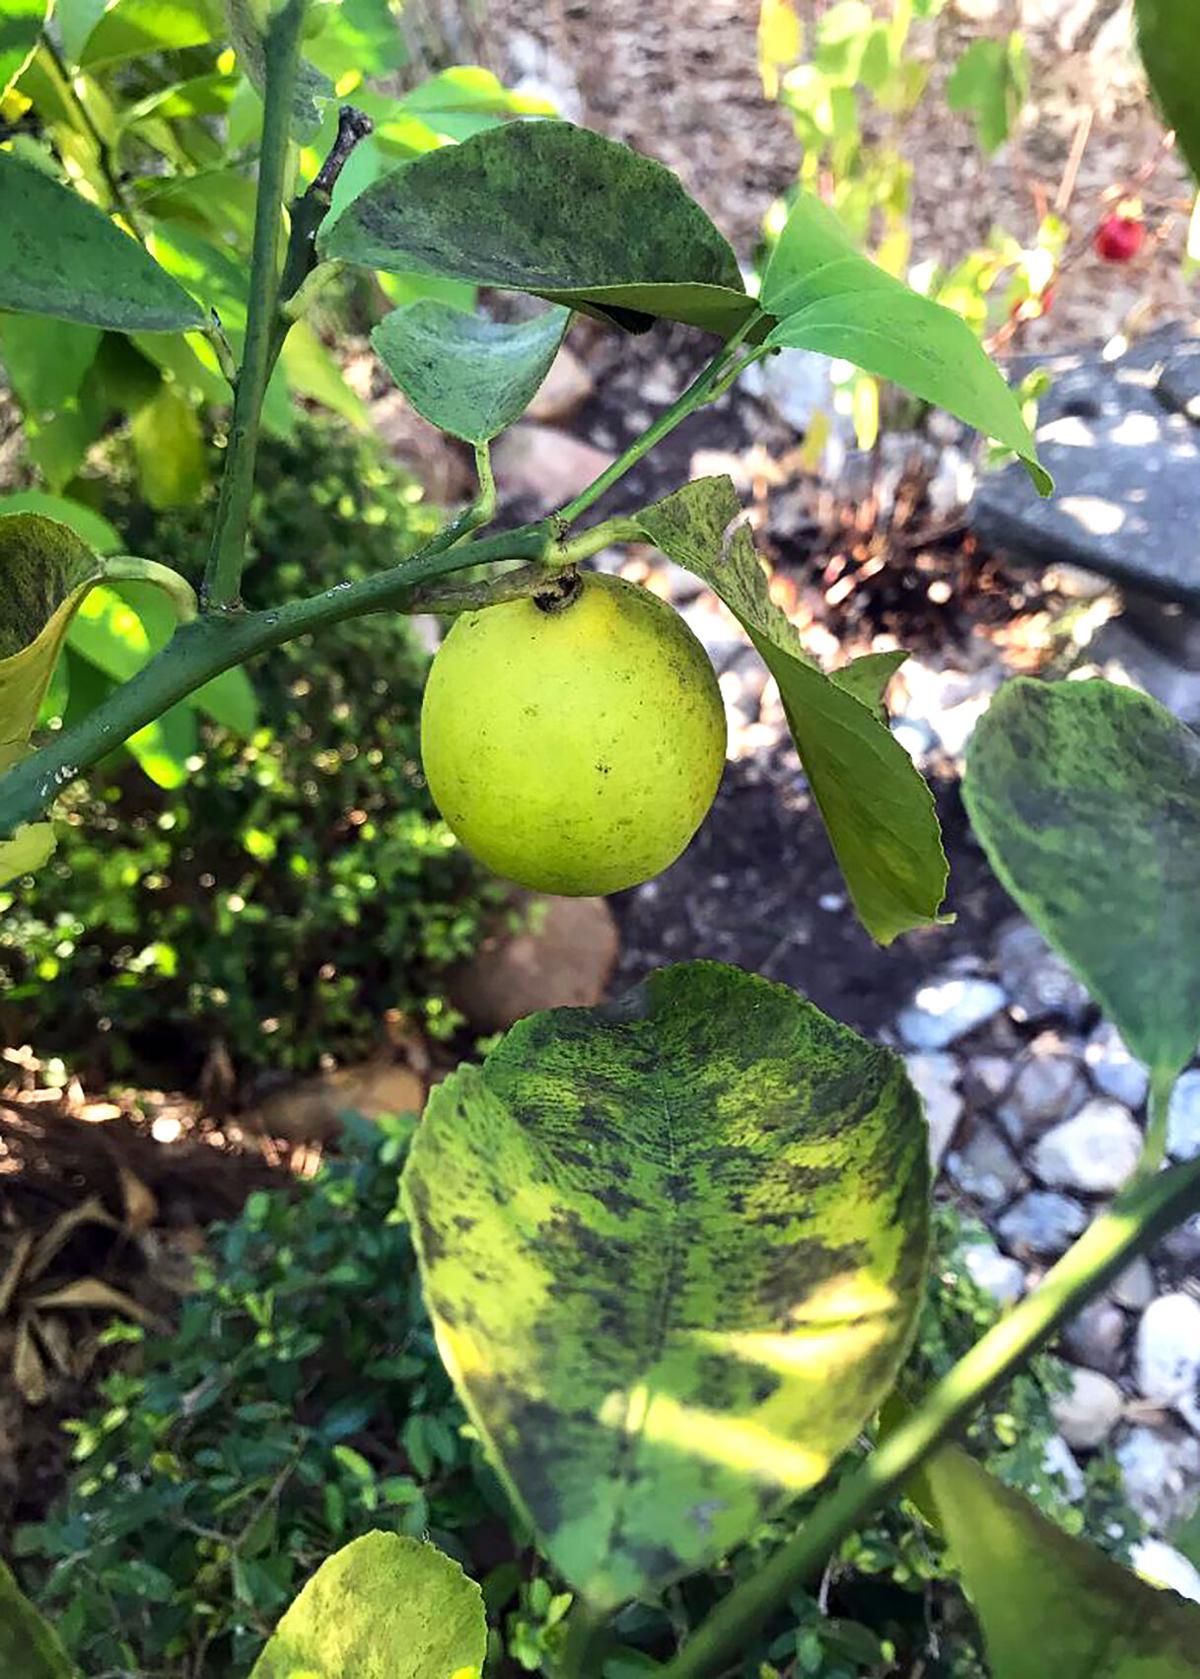 Sooty mold on Meyer lemon